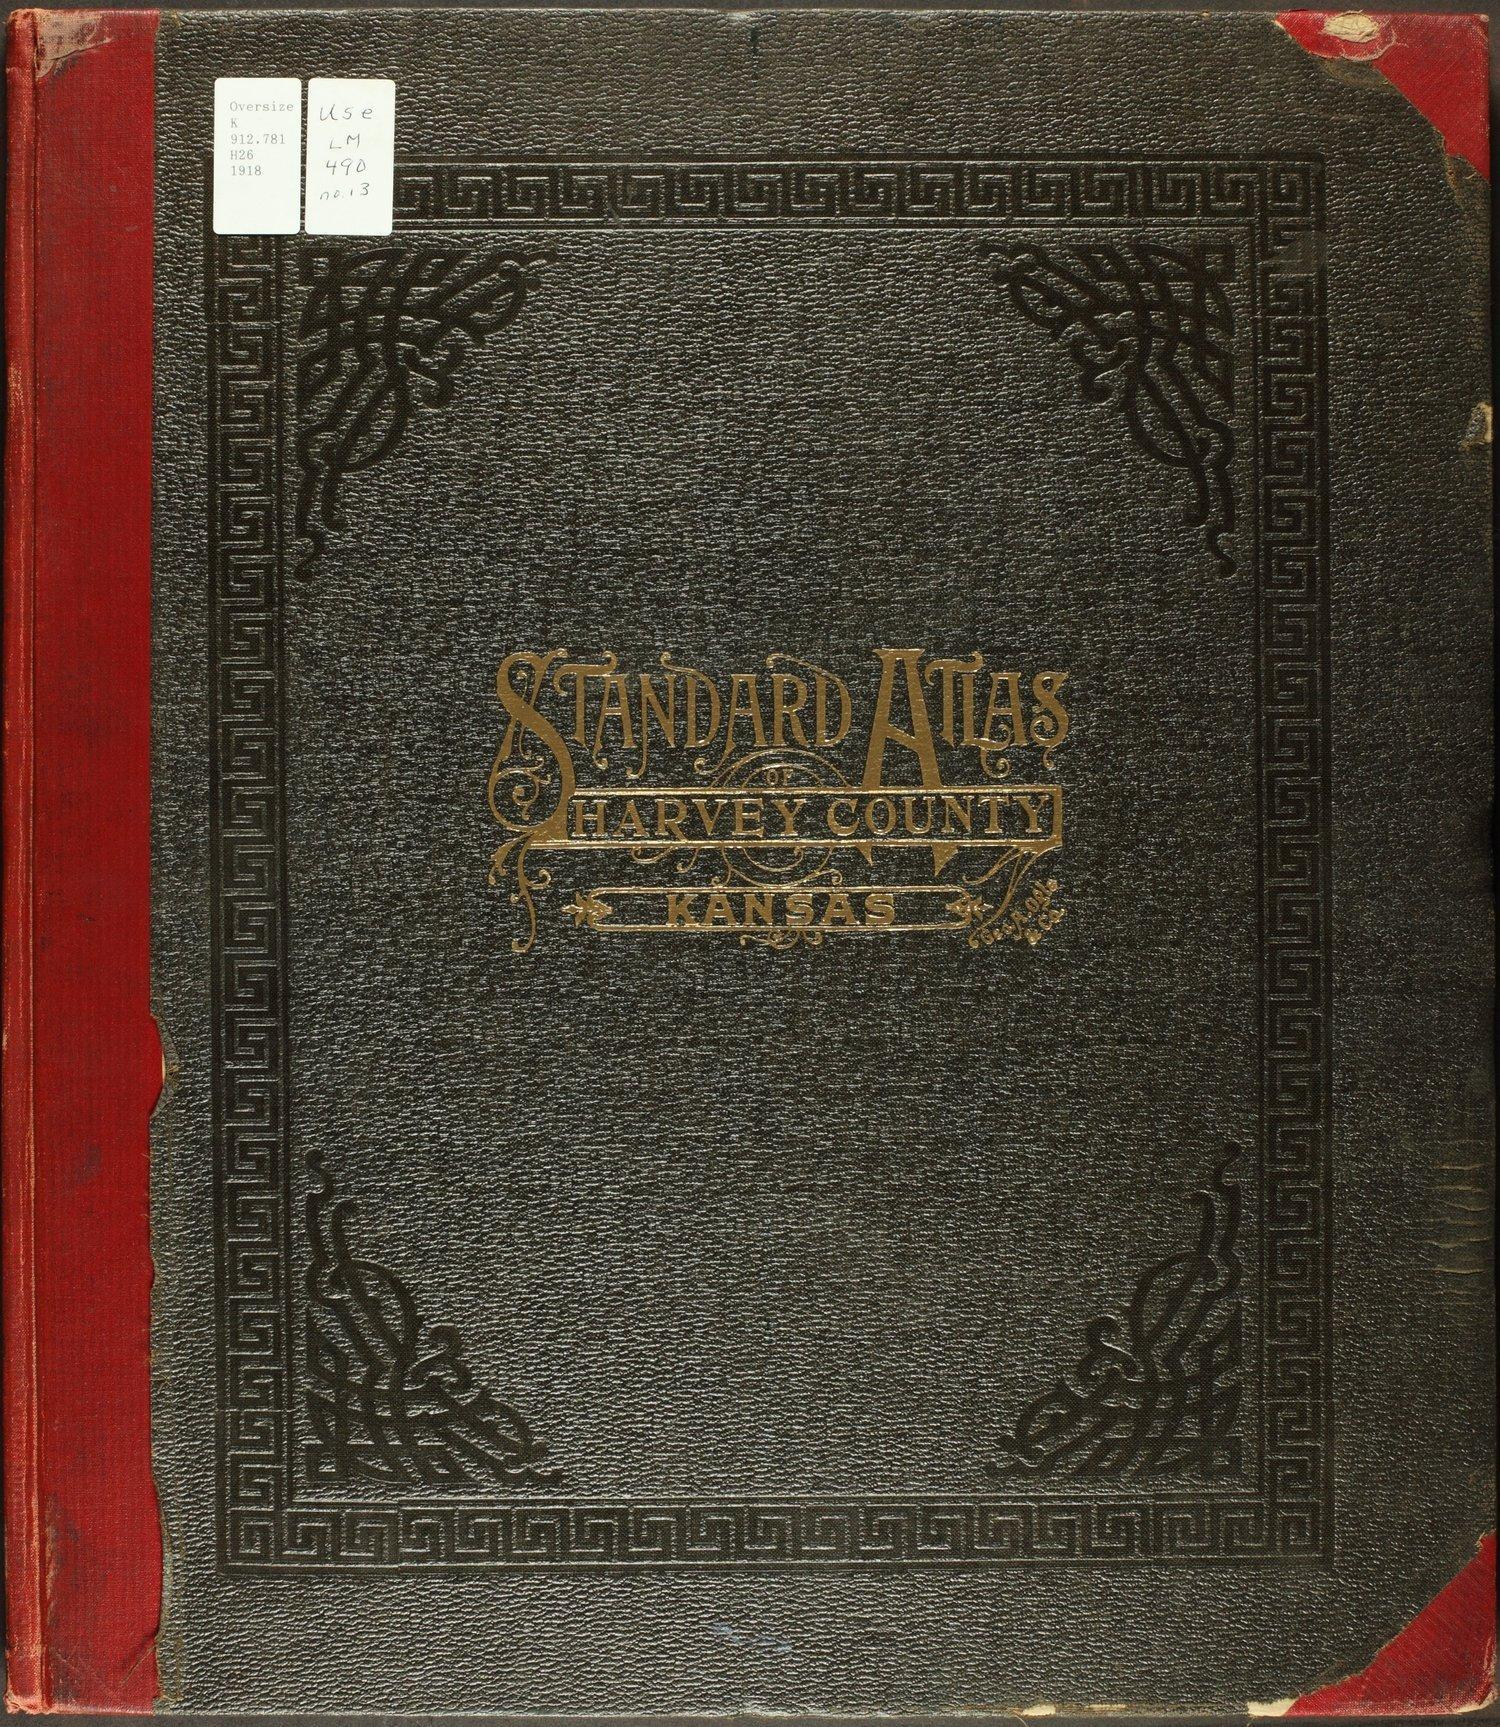 Standard atlas of Harvey County, Kansas - Front Cover